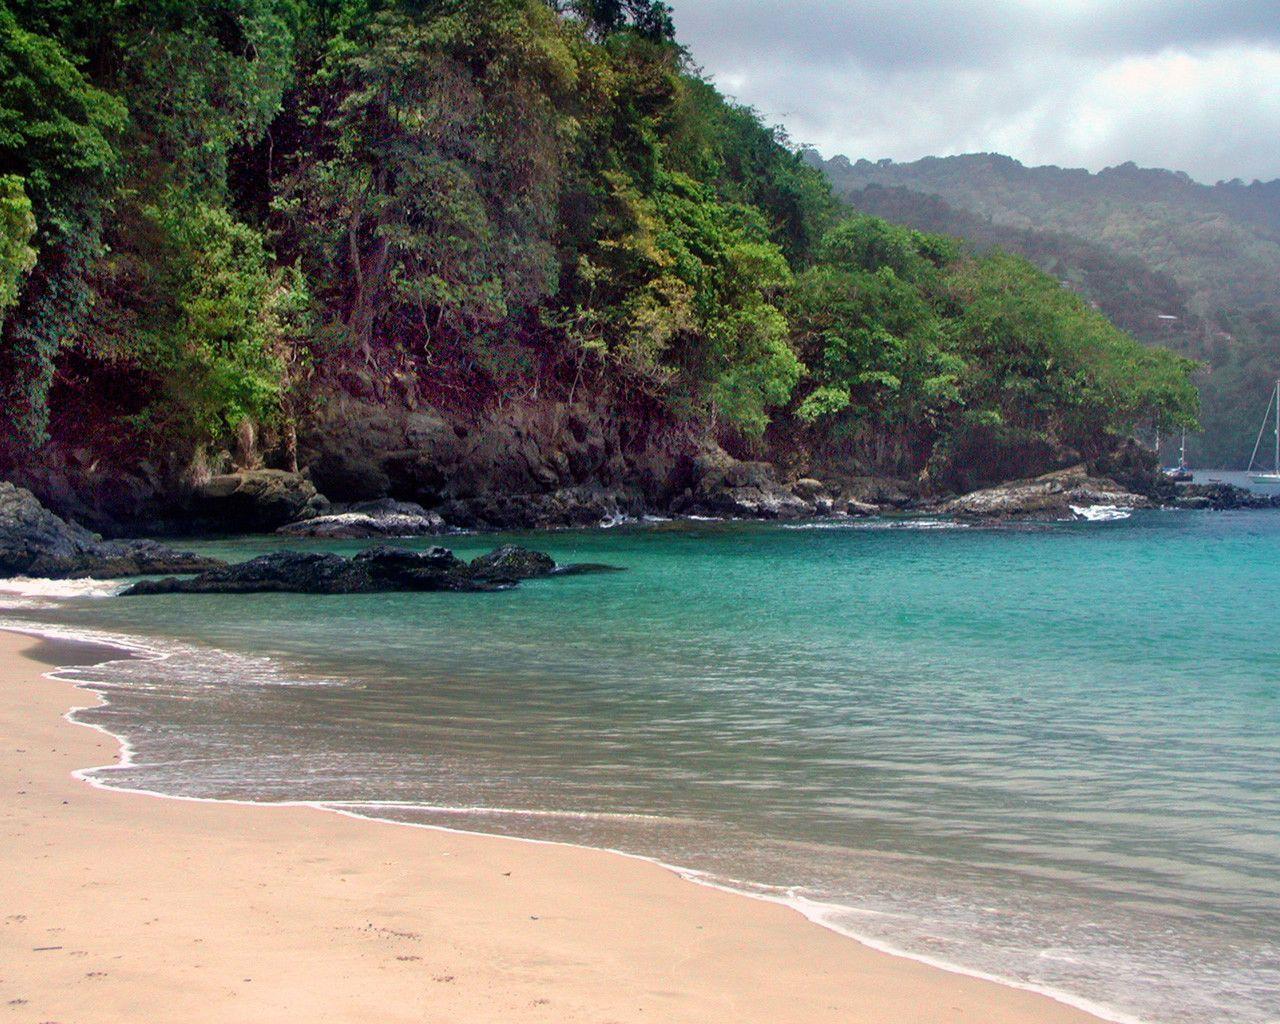 Tropical Island Desktop Backgrounds 1280x1024